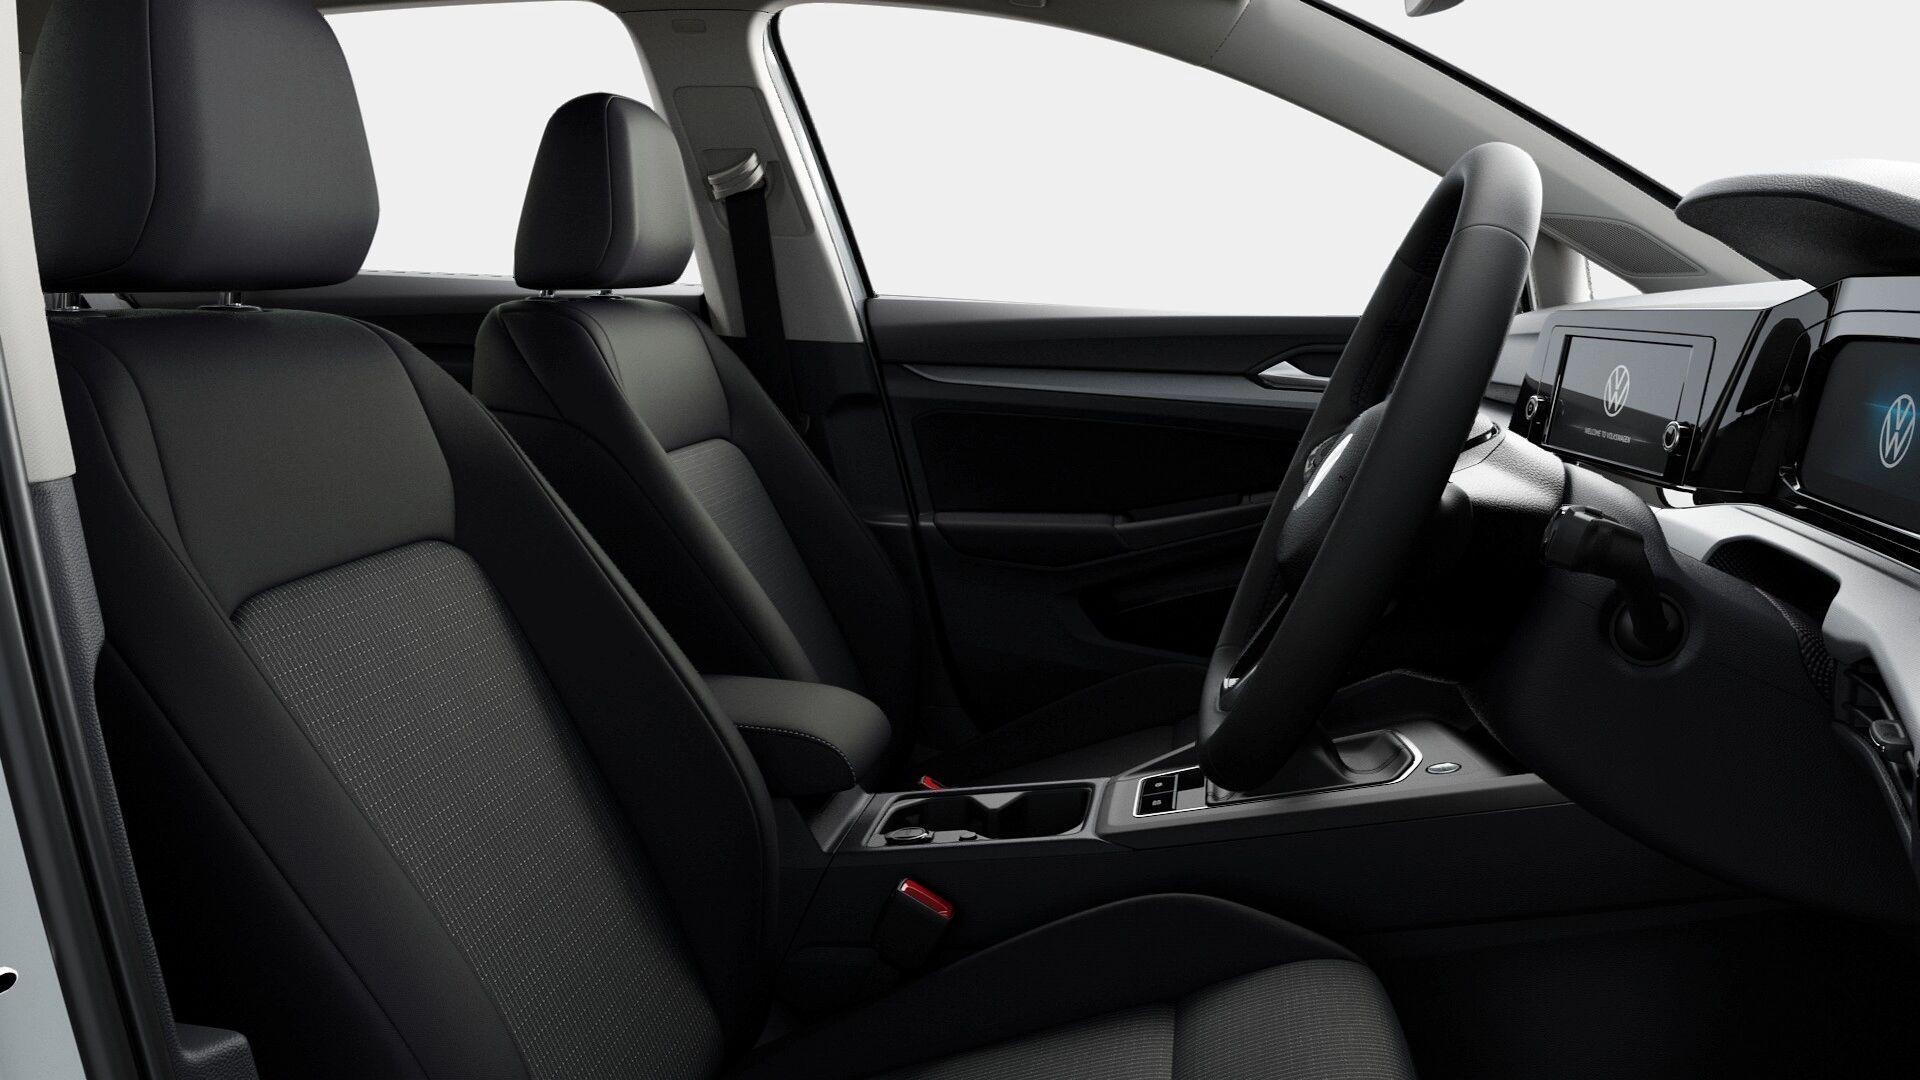 golf-gti-interior-front-seats